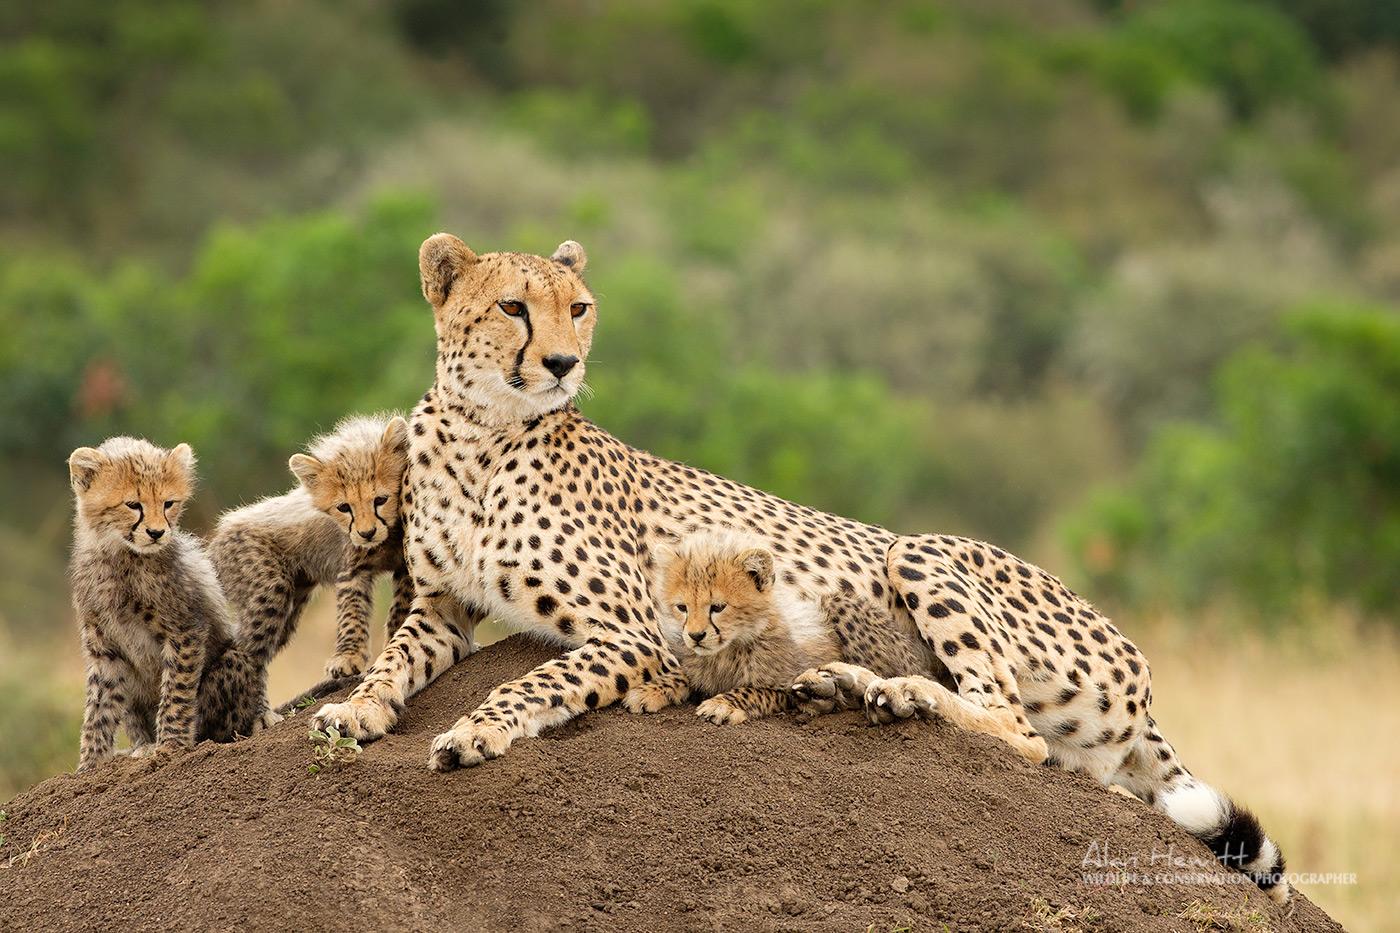 Cheetah & Cubs, Masai Mara Wildlife Photography Safari